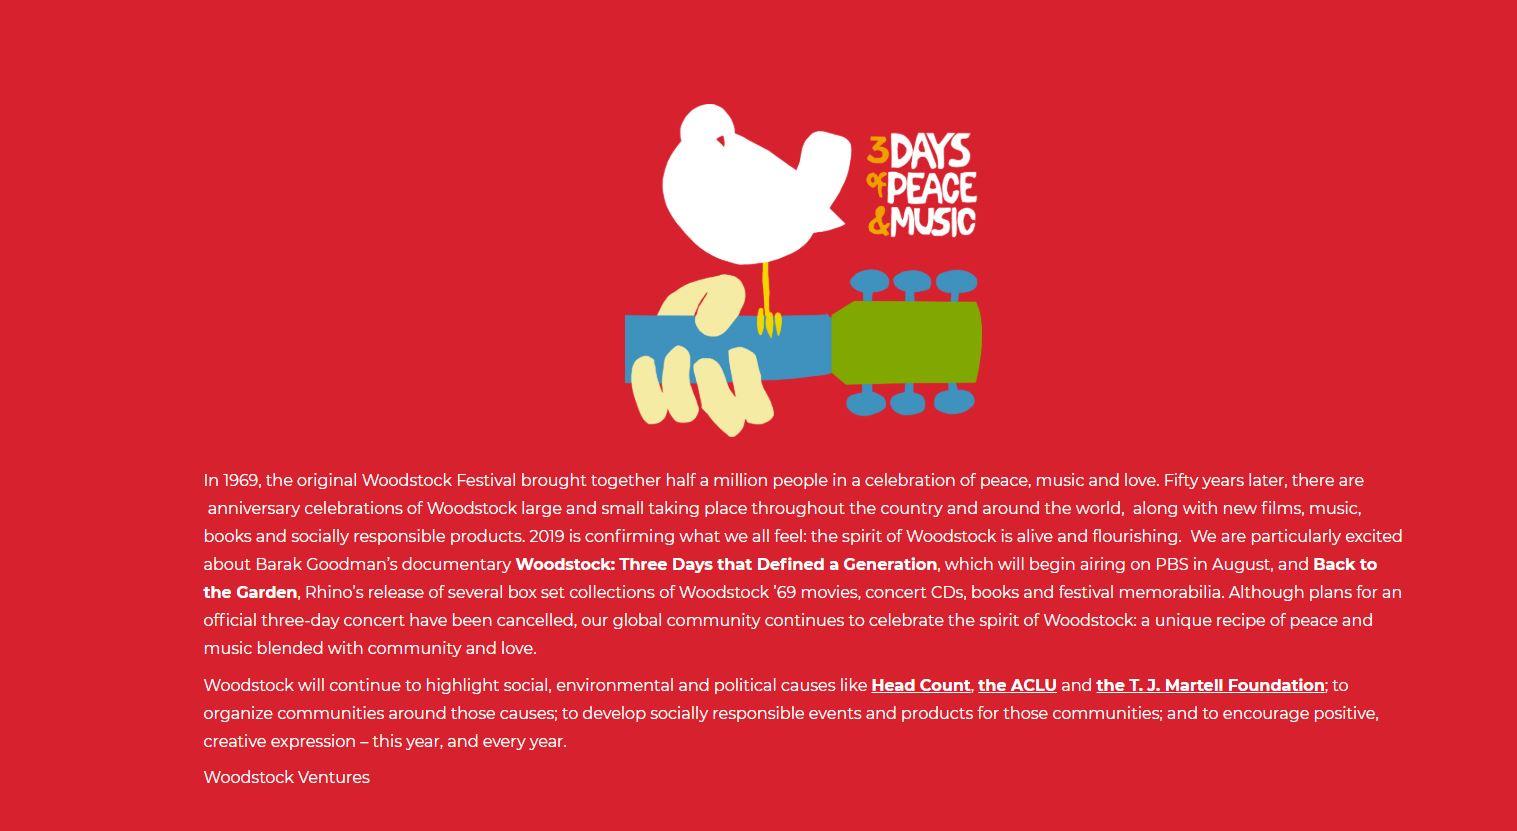 Official Woodstock website - The original Woodstock Poster was designed by Arnold Skolnick